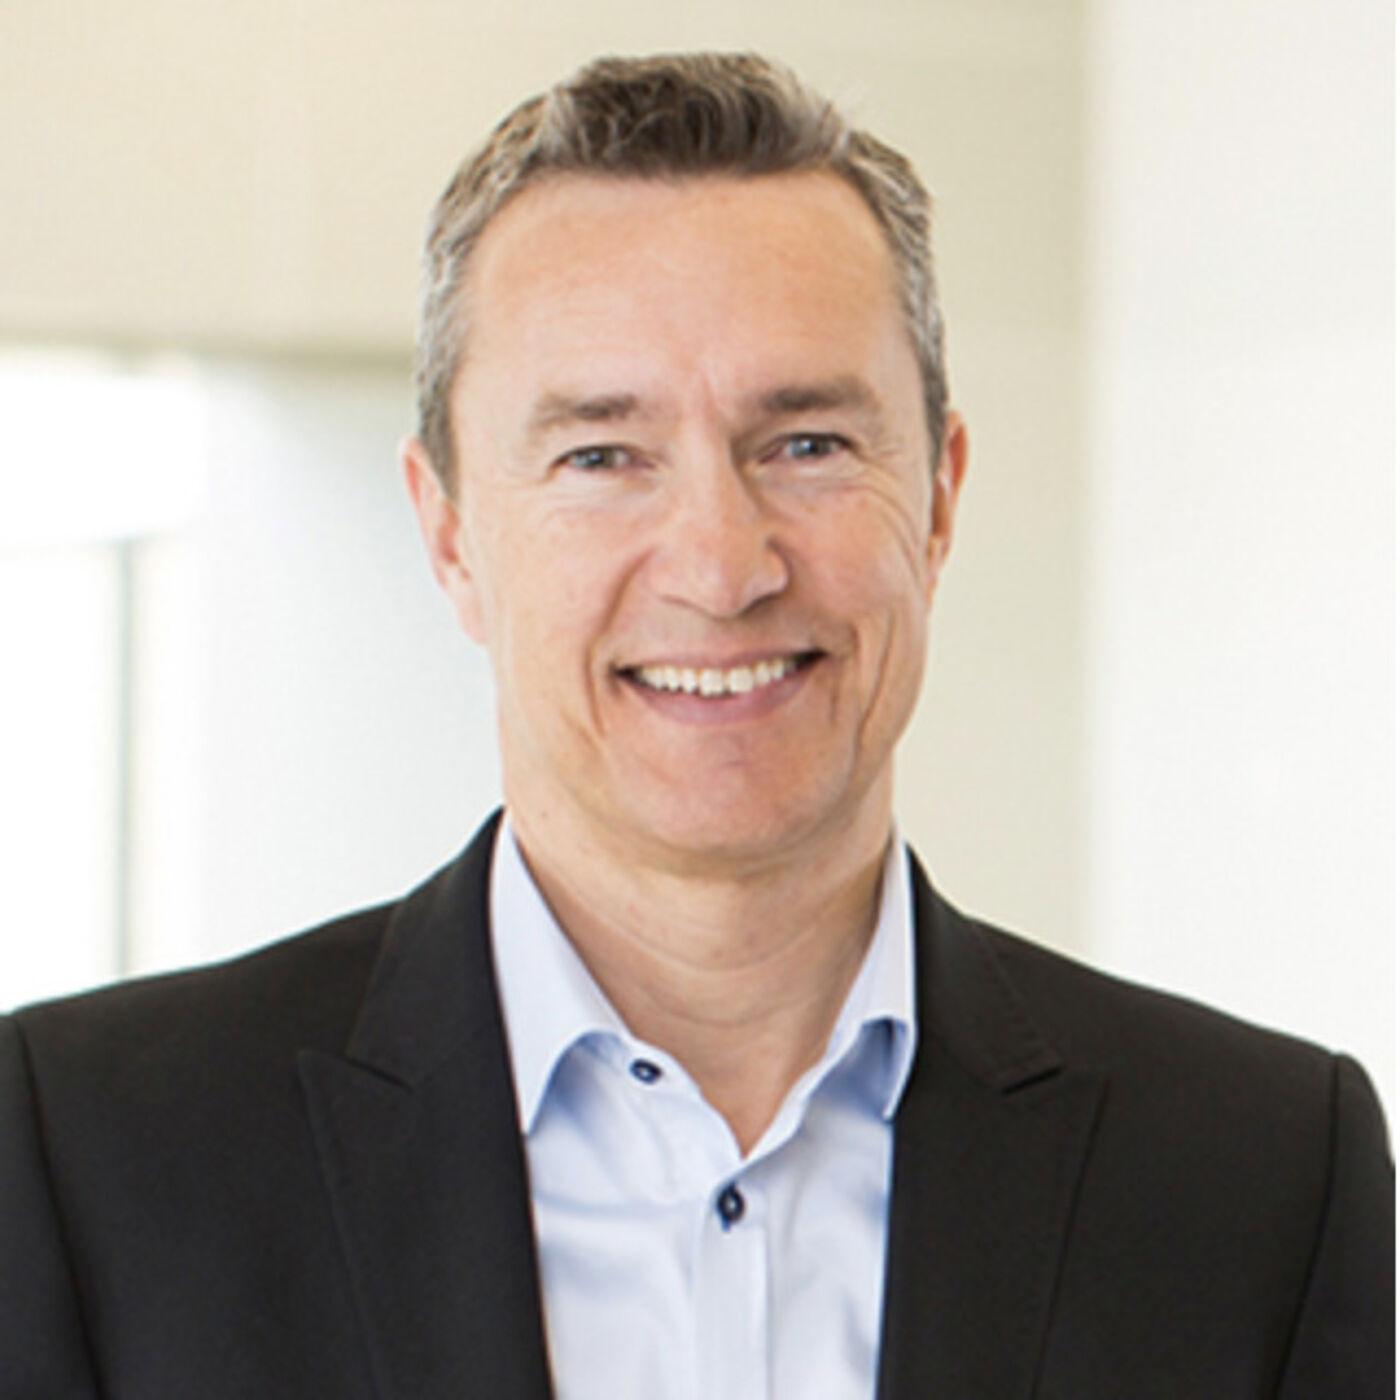 Infoblox CEO and President Jesper Andersen  - Episode 24